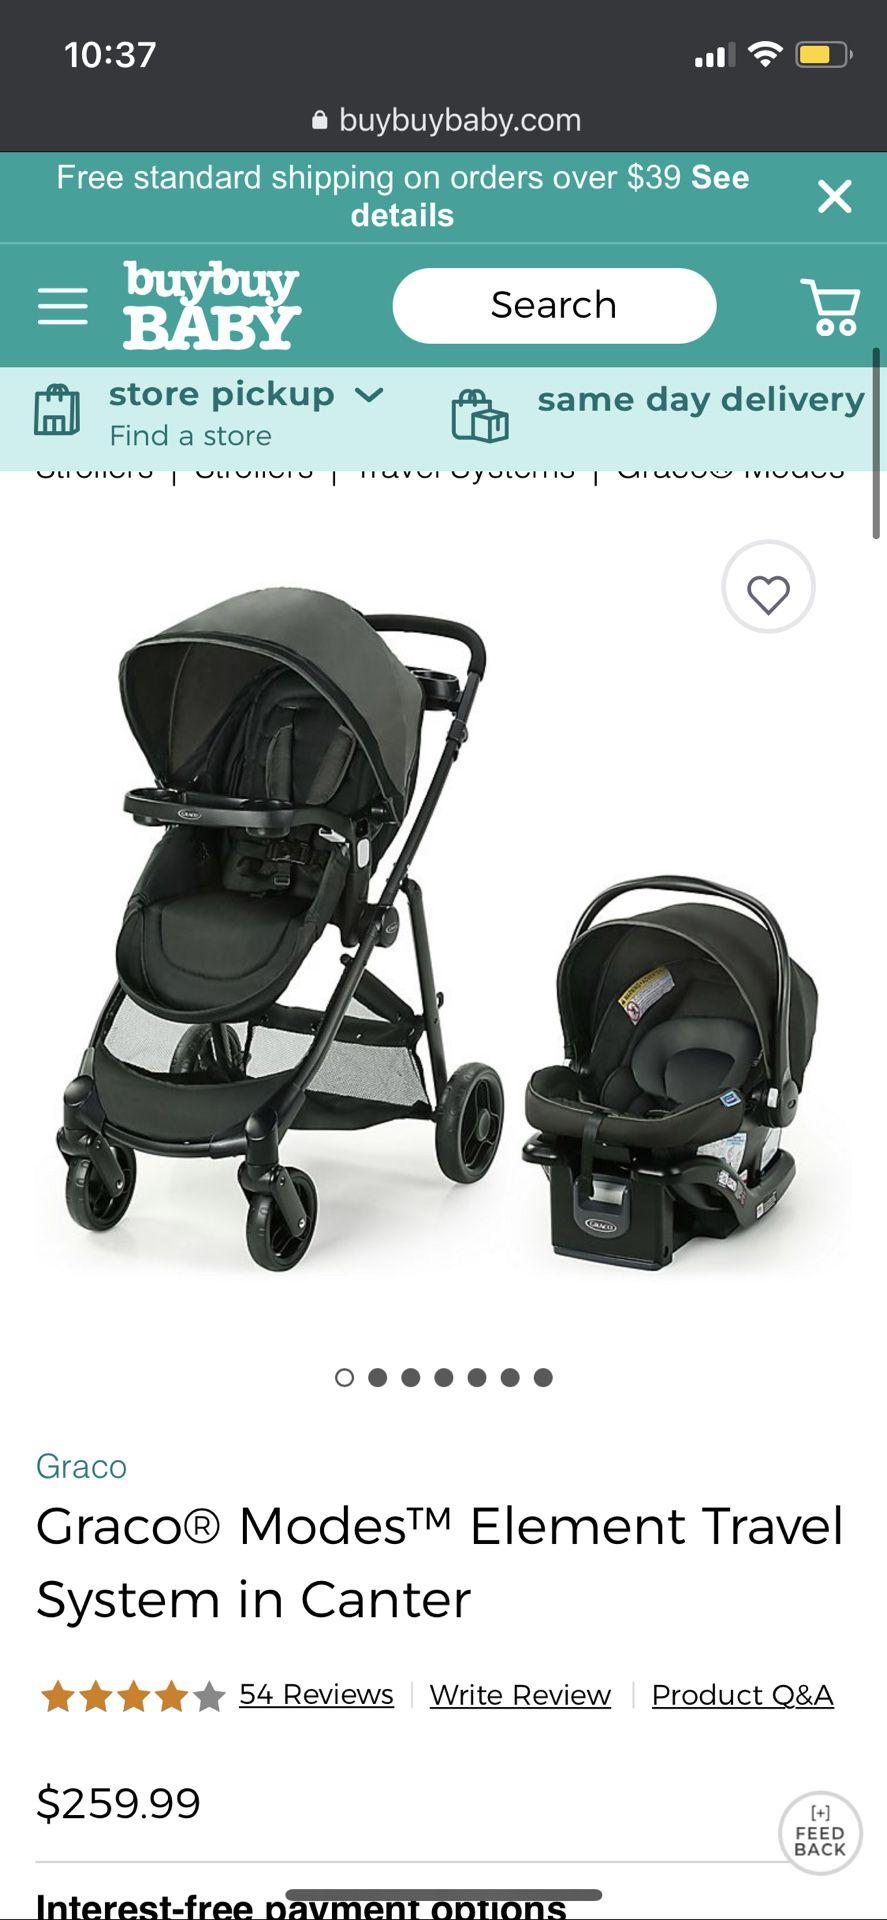 Unopened GRACO Stroller & Infant Car Seat